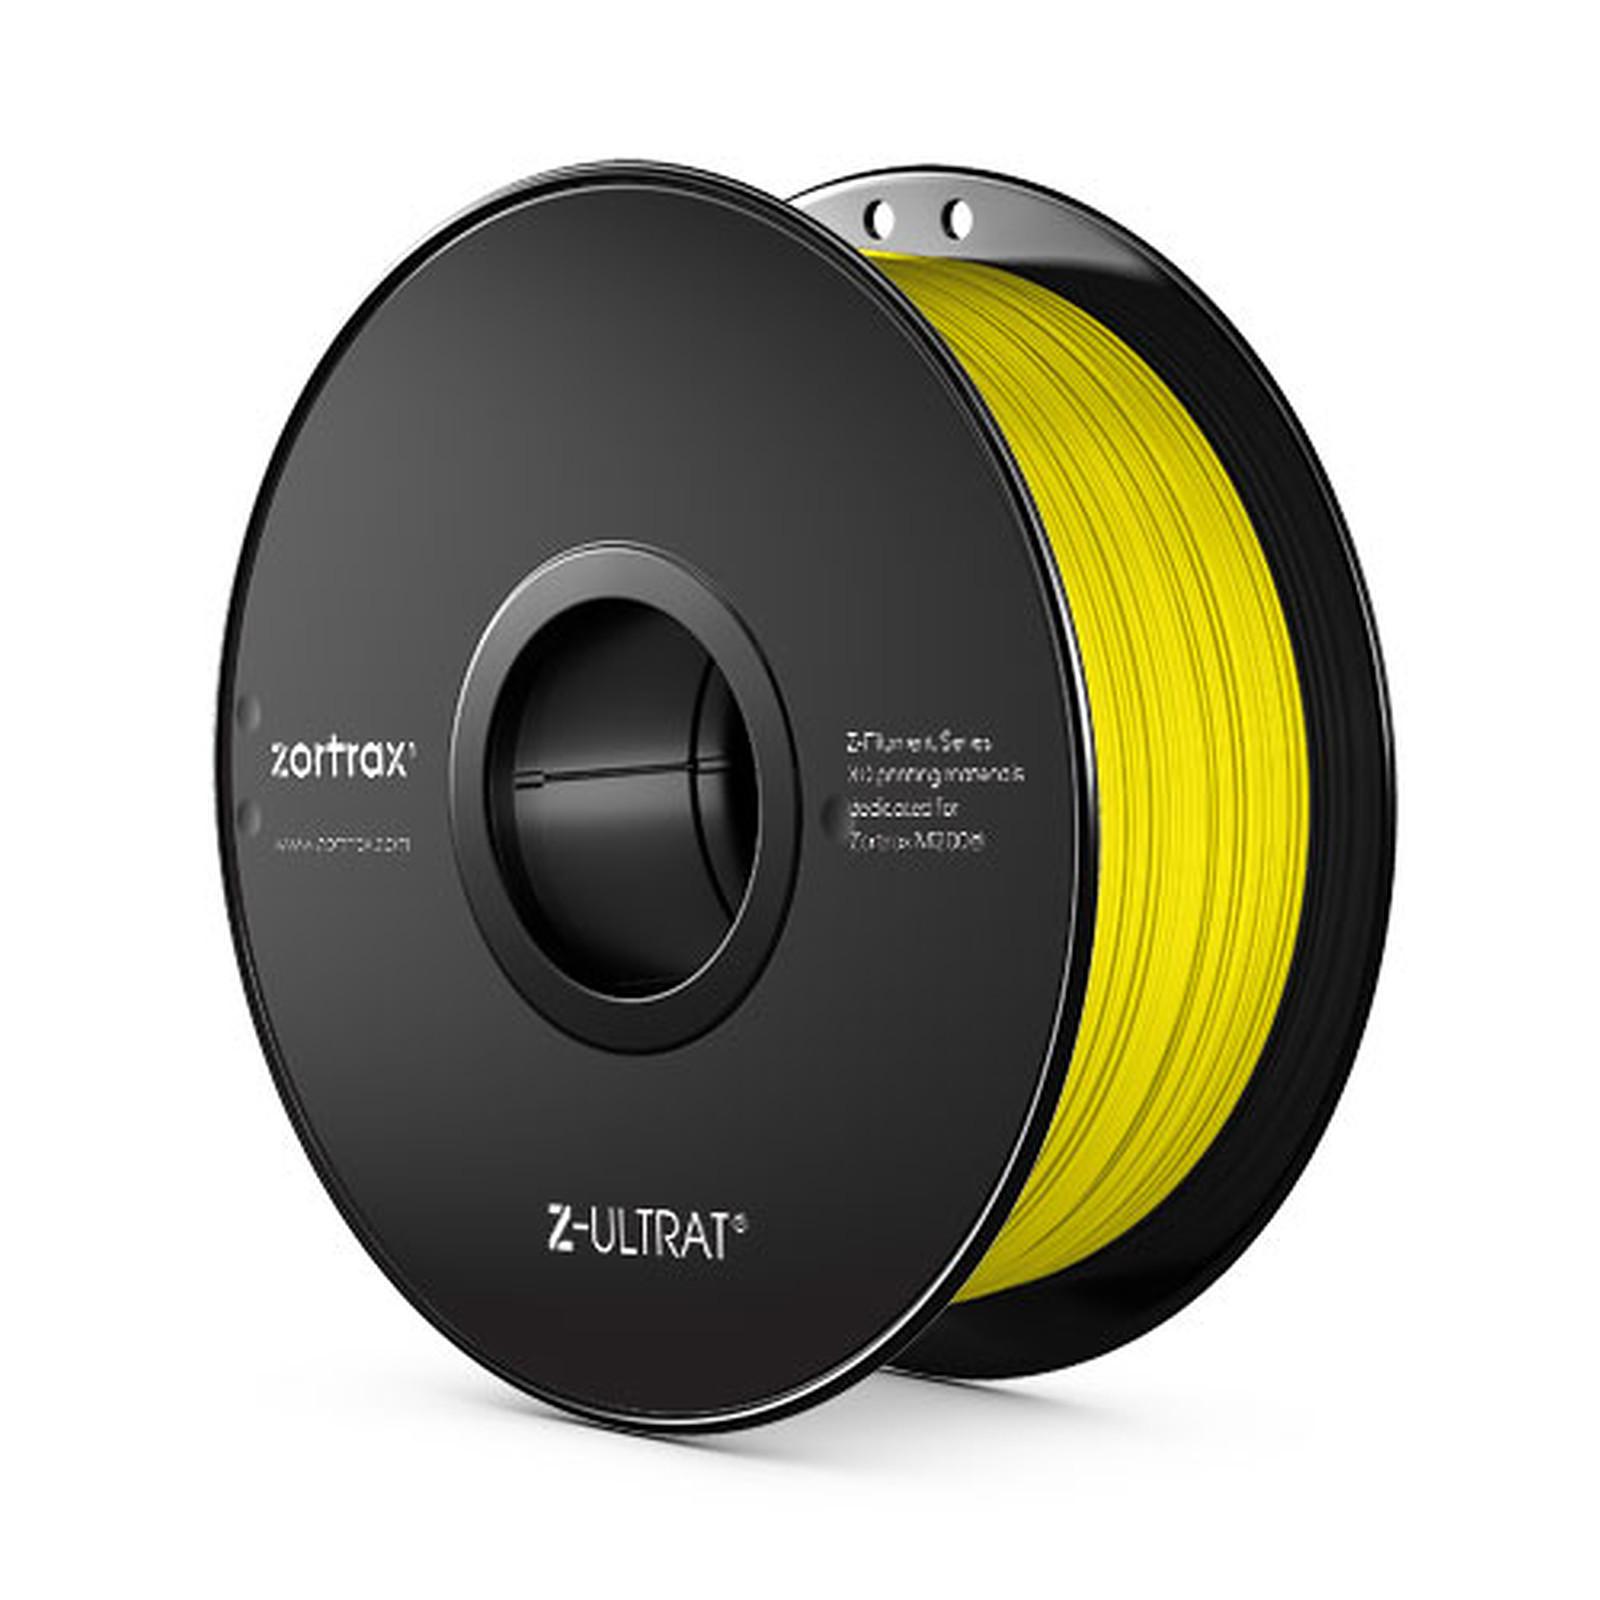 Zortrax Z-ULTRAT 800 g - Jaune